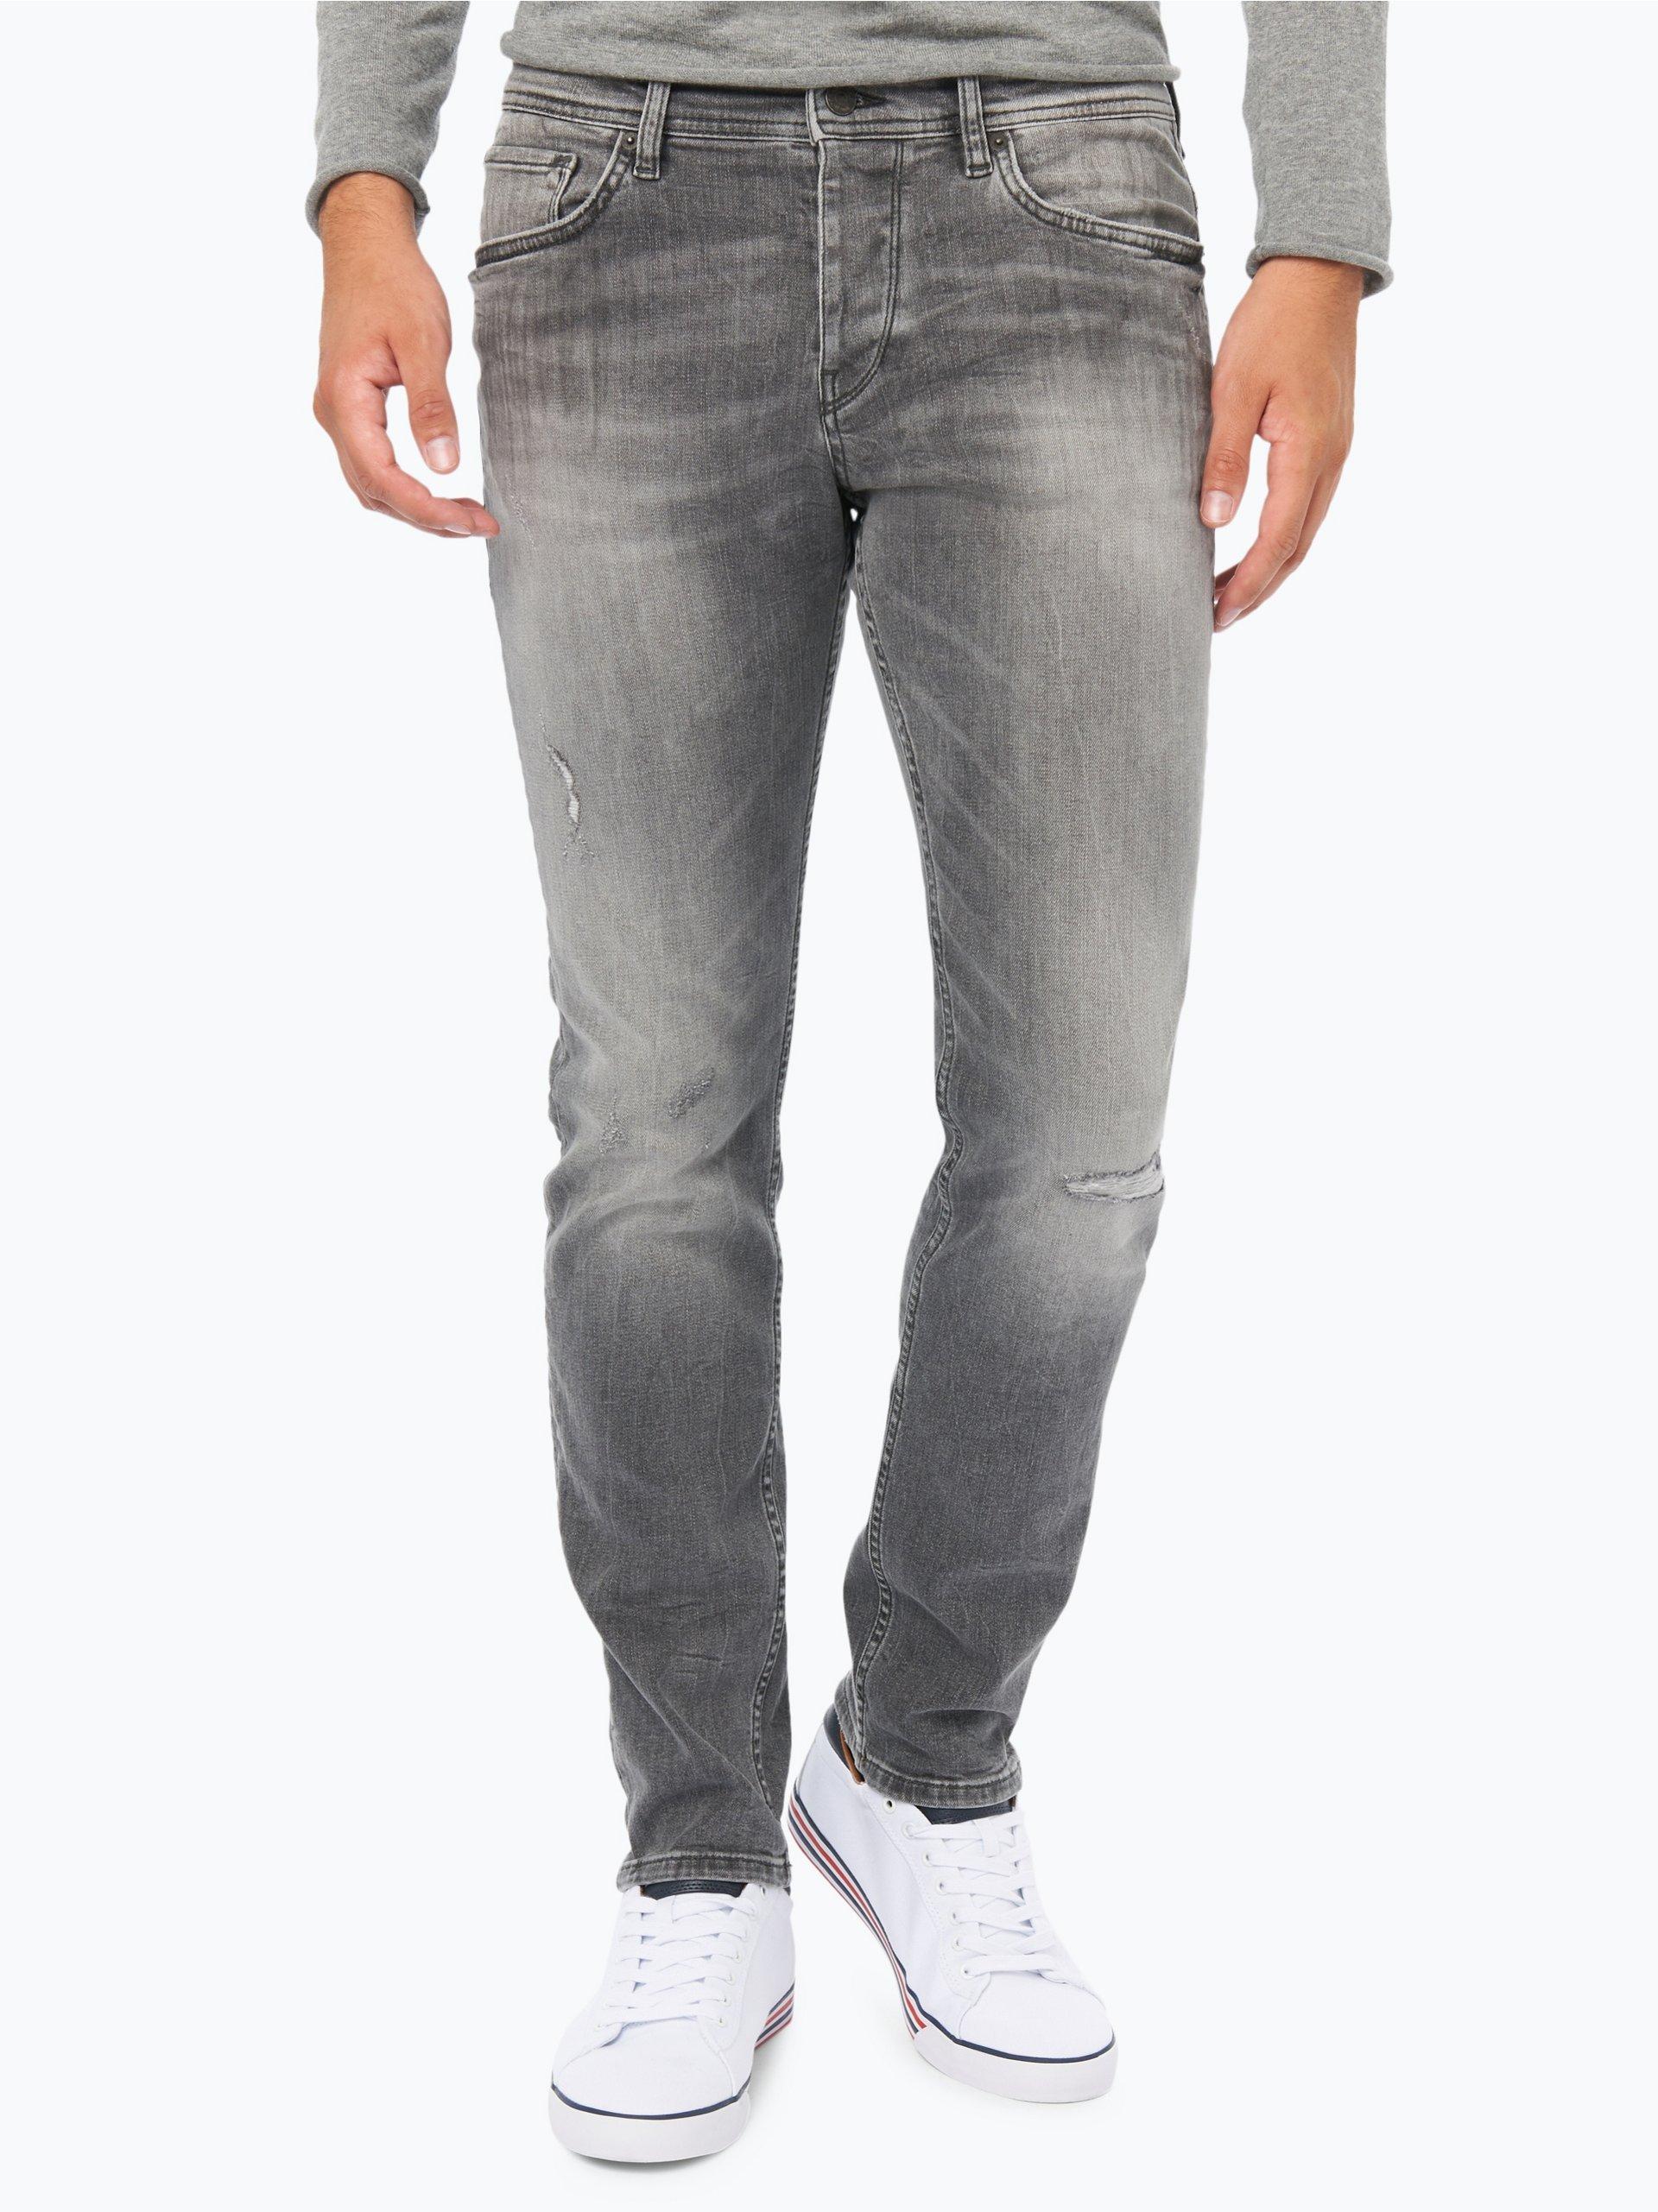 boss casual herren jeans orange 90 grau uni online kaufen vangraaf com. Black Bedroom Furniture Sets. Home Design Ideas